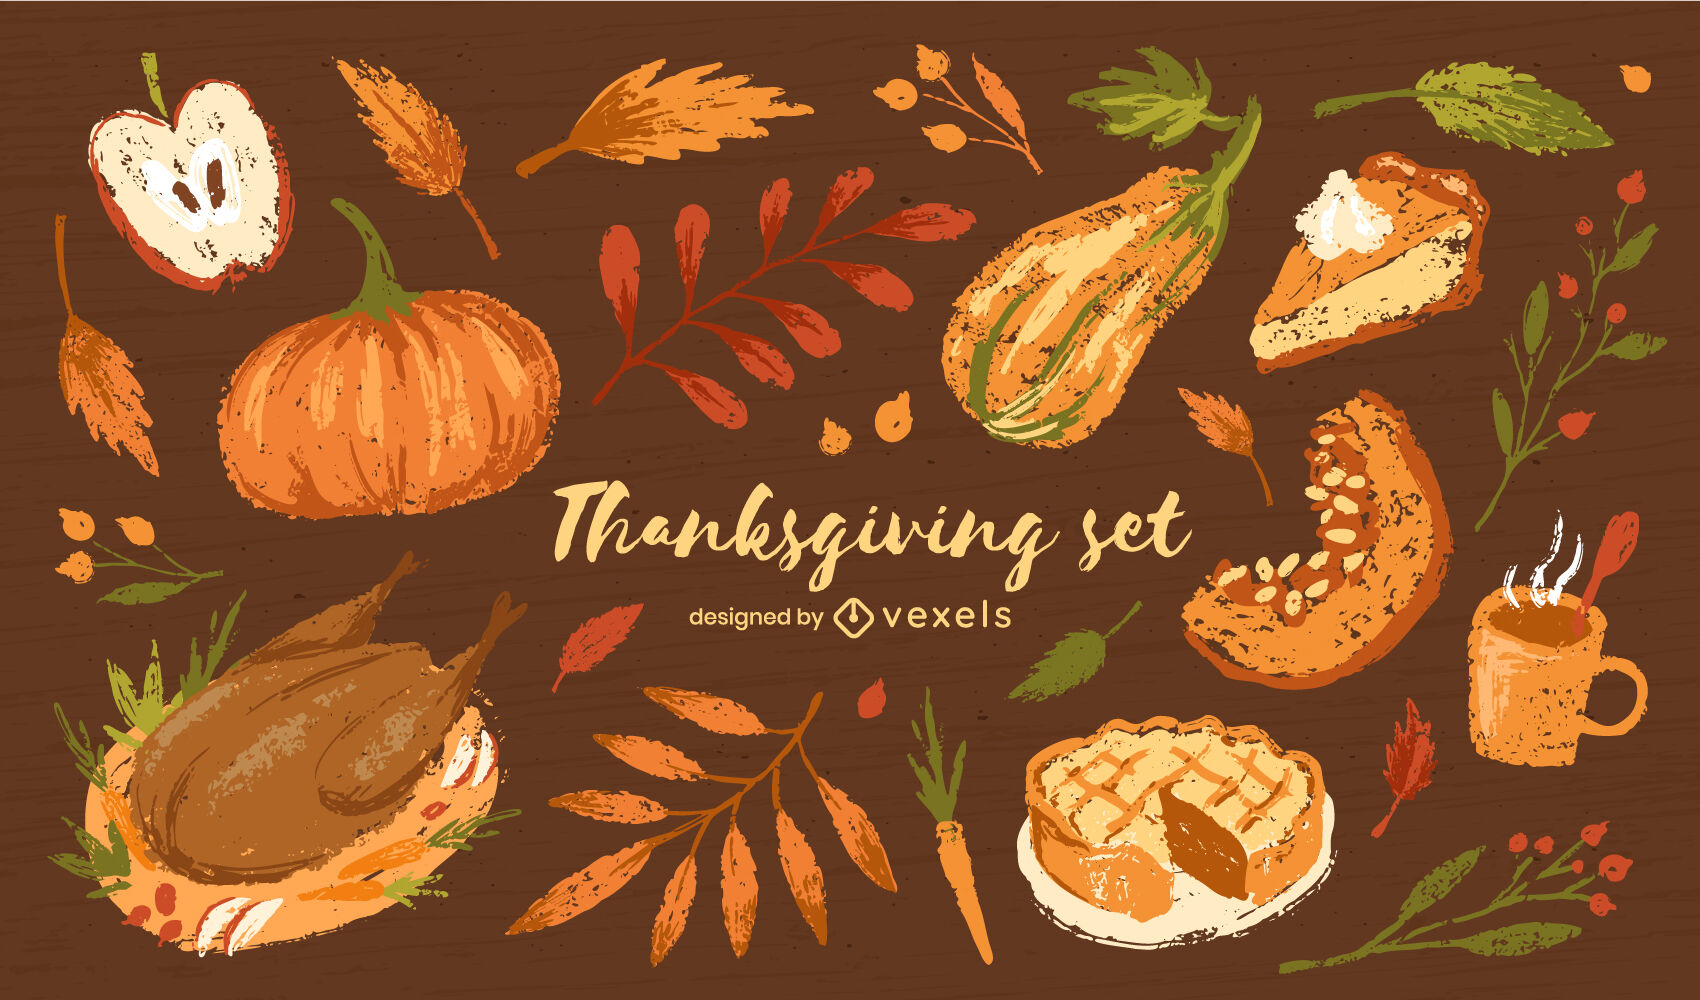 Thanksgiving holiday food elements set